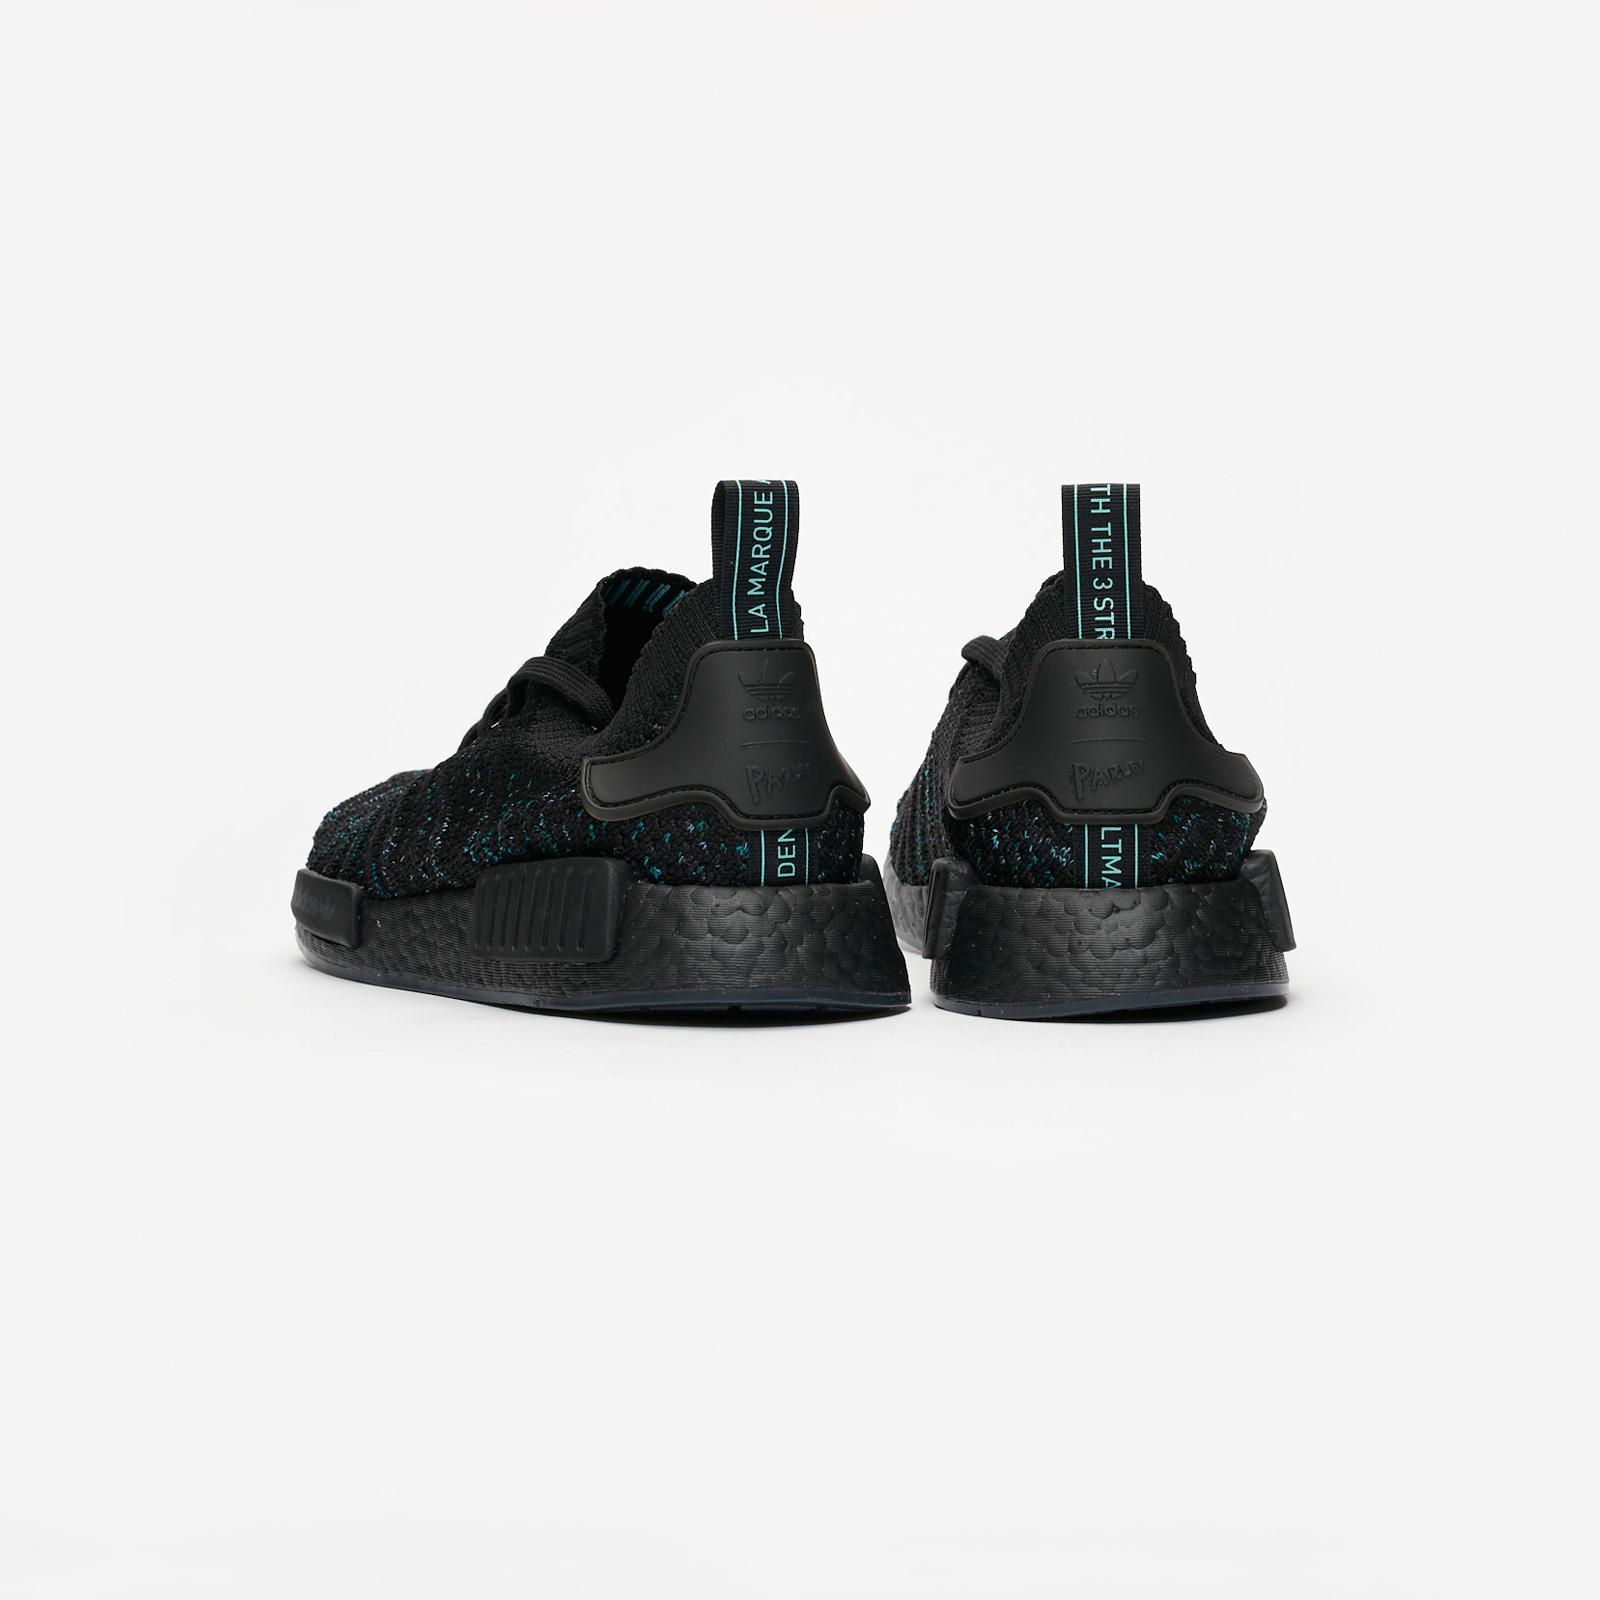 half off 62614 32a55 adidas NMD_R1 STLT Parley PK - Aq0943 - Sneakersnstuff ...